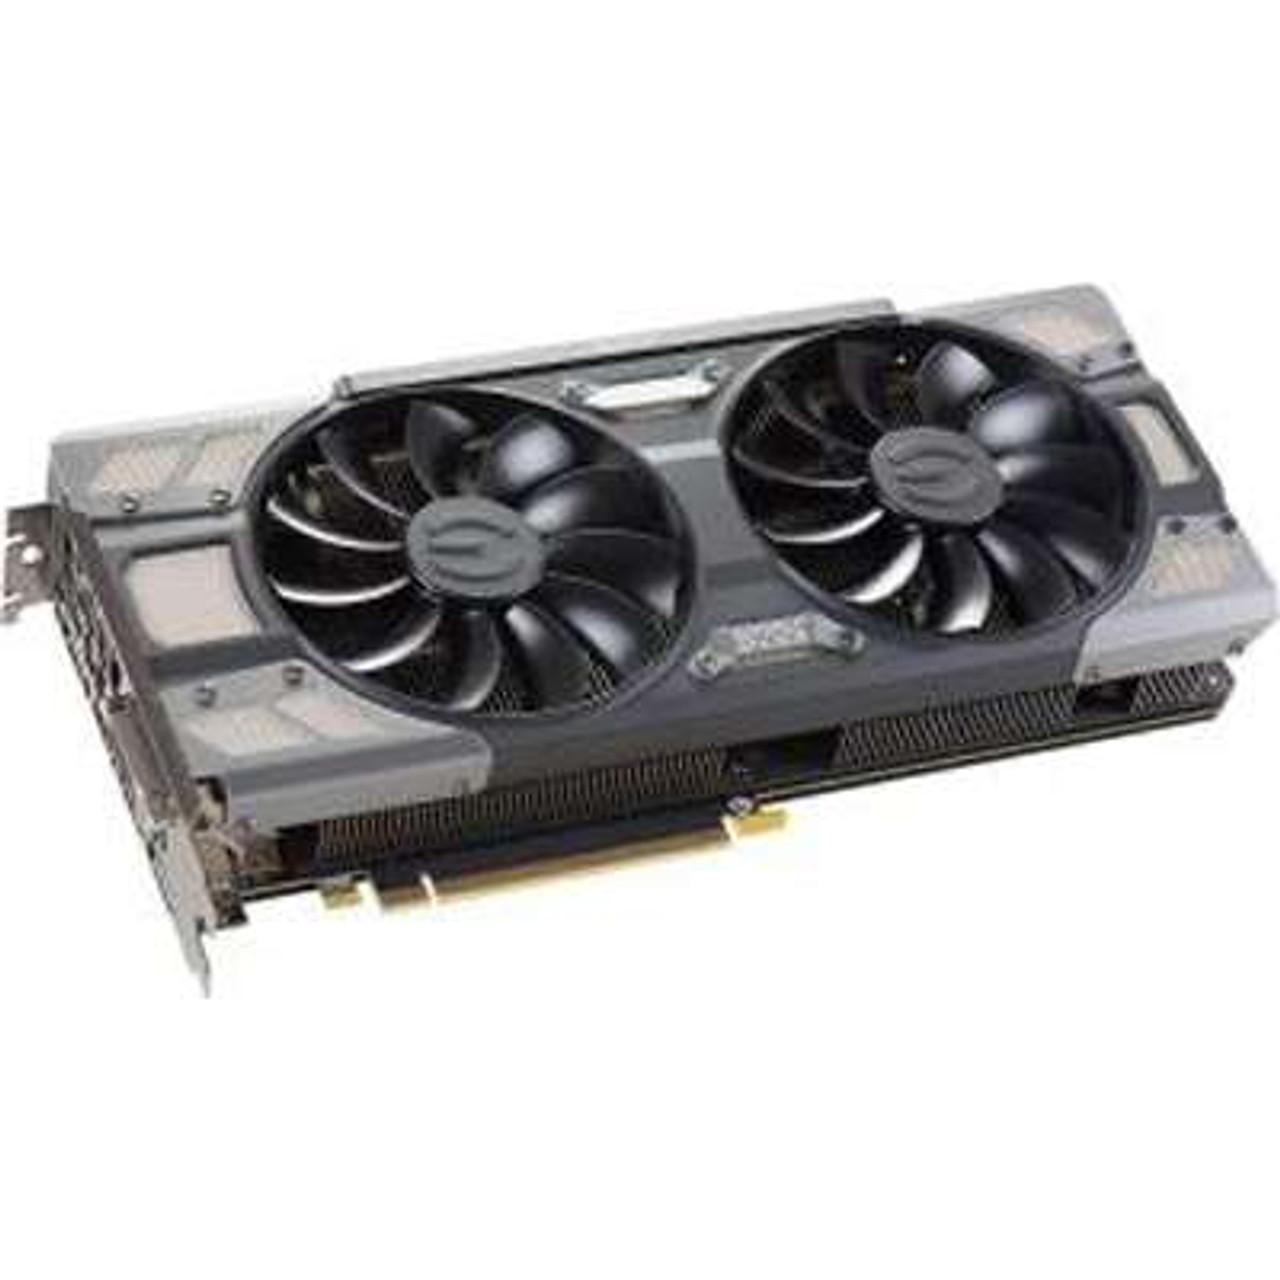 EVGA 08G-P4-6276-KR - Geforce GTX 1070 FTW Gaming ACX 3 0 8GB Base/Boost  (Clock) 1607/1797MHz